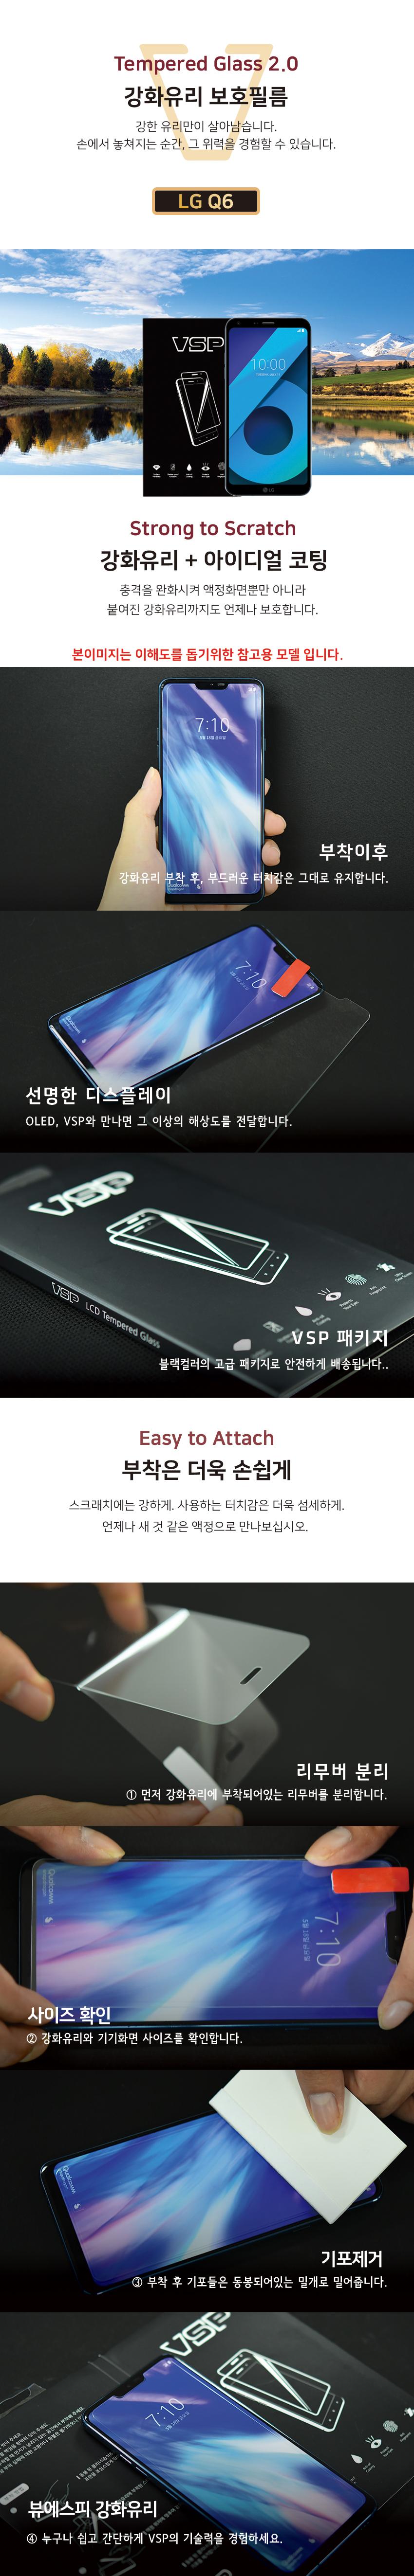 LG Q6 강화유리 액정보호필름 1매 - 뷰에스피, 7,700원, 필름/스킨, 기타 옵티머스 제품